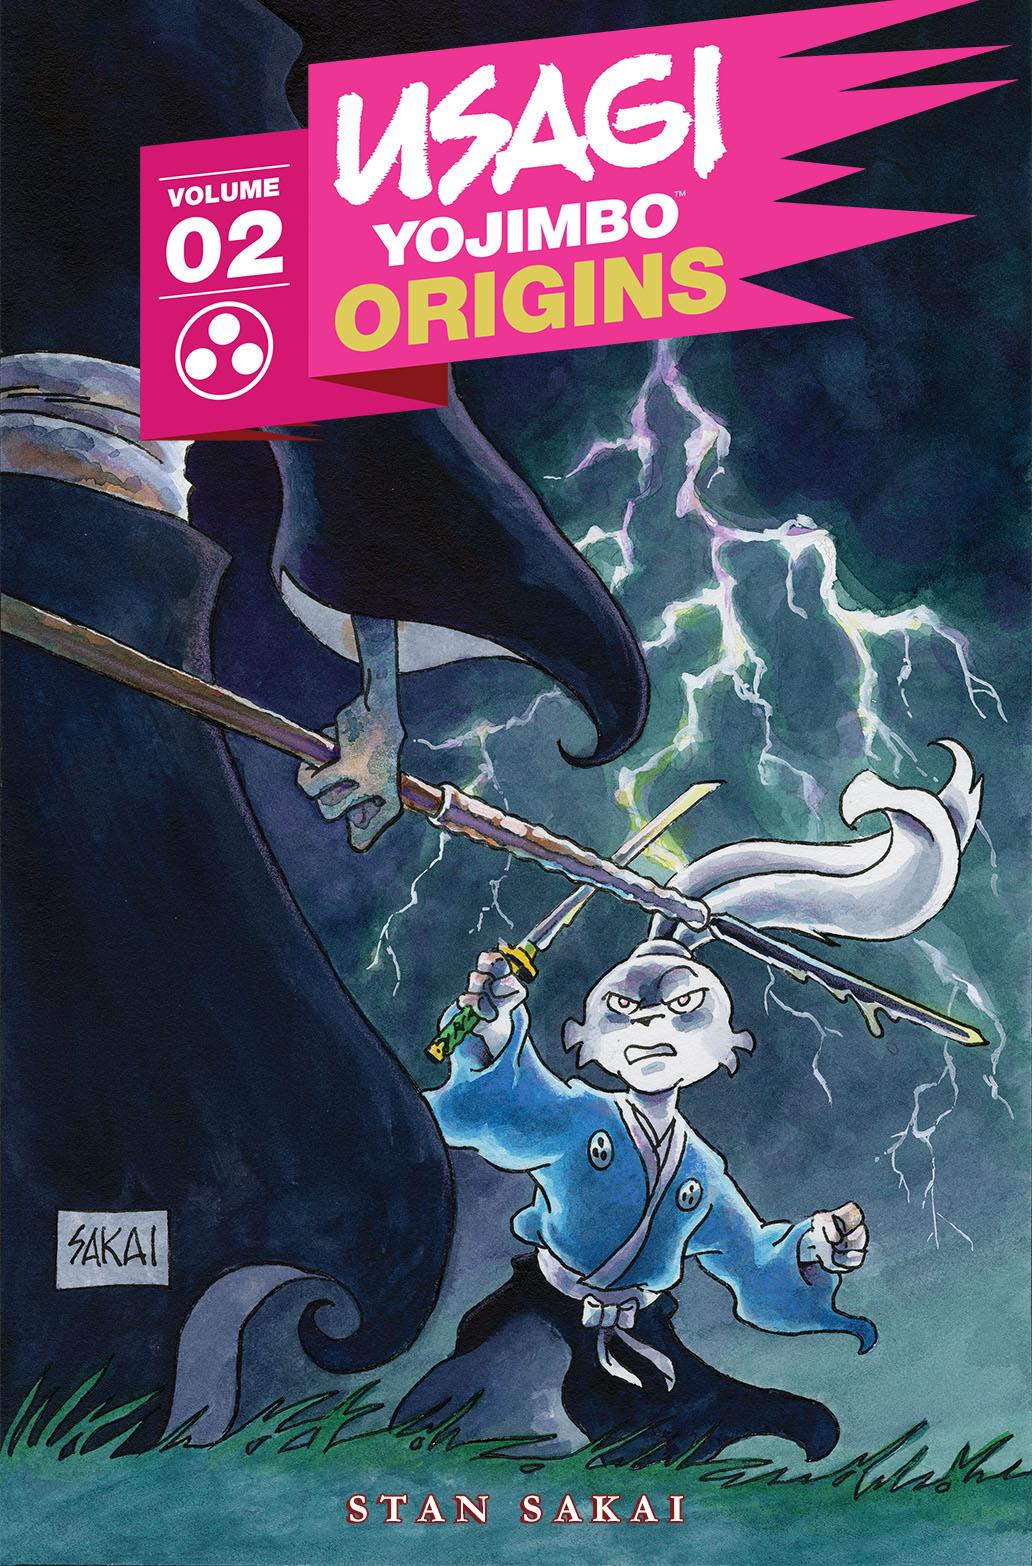 Usagi-Origins-v02_cvr-copy IDW Publishing July 2021 Solicitations